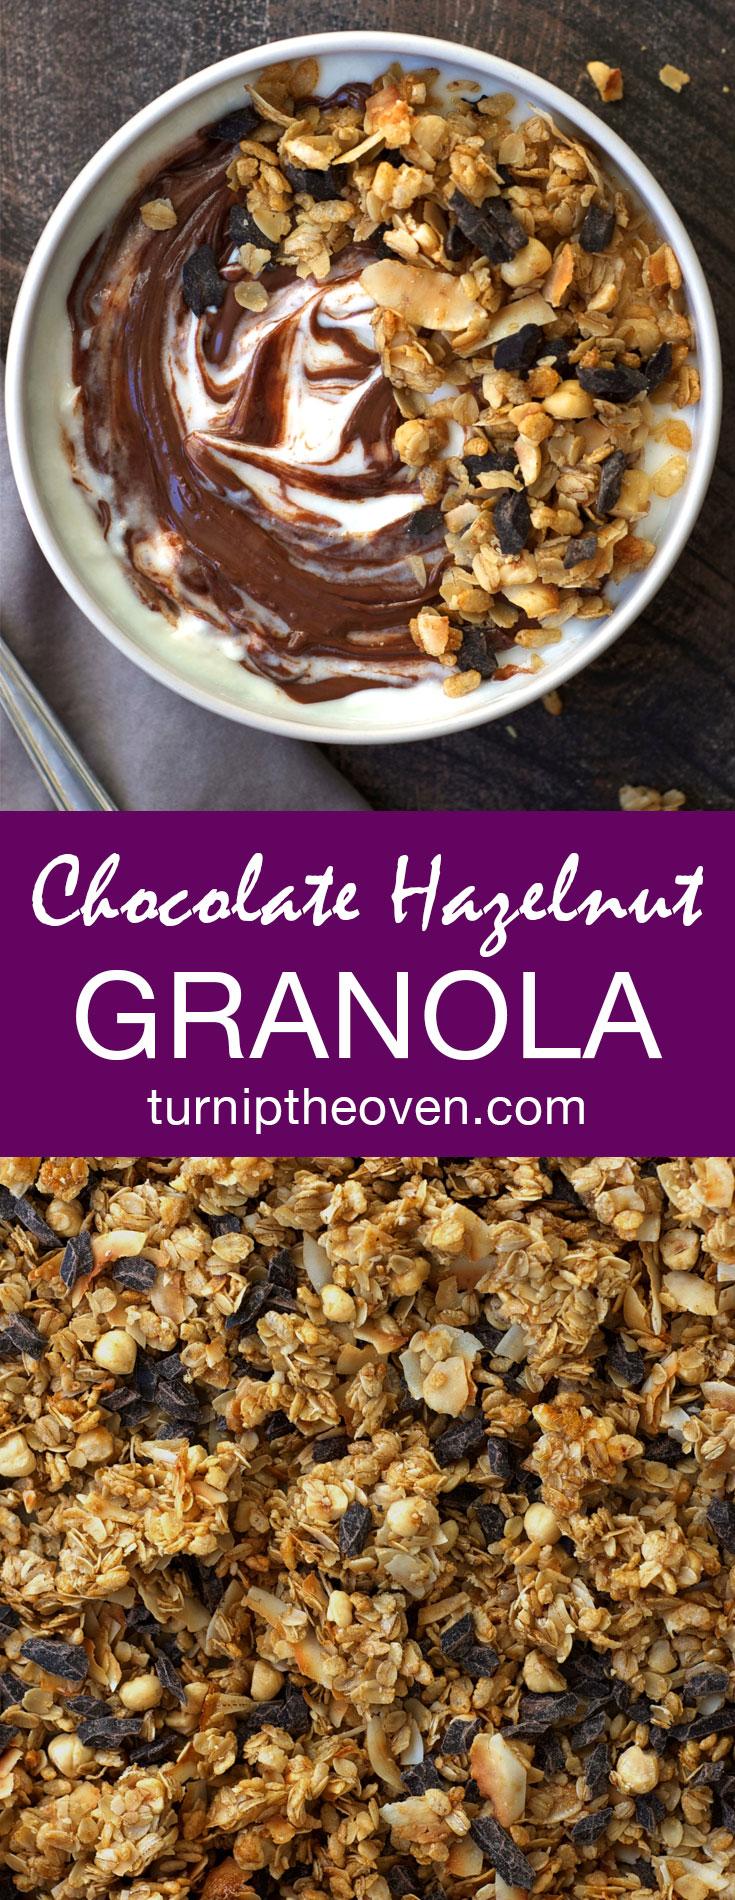 Chunky Chocolate Hazelnut Granola